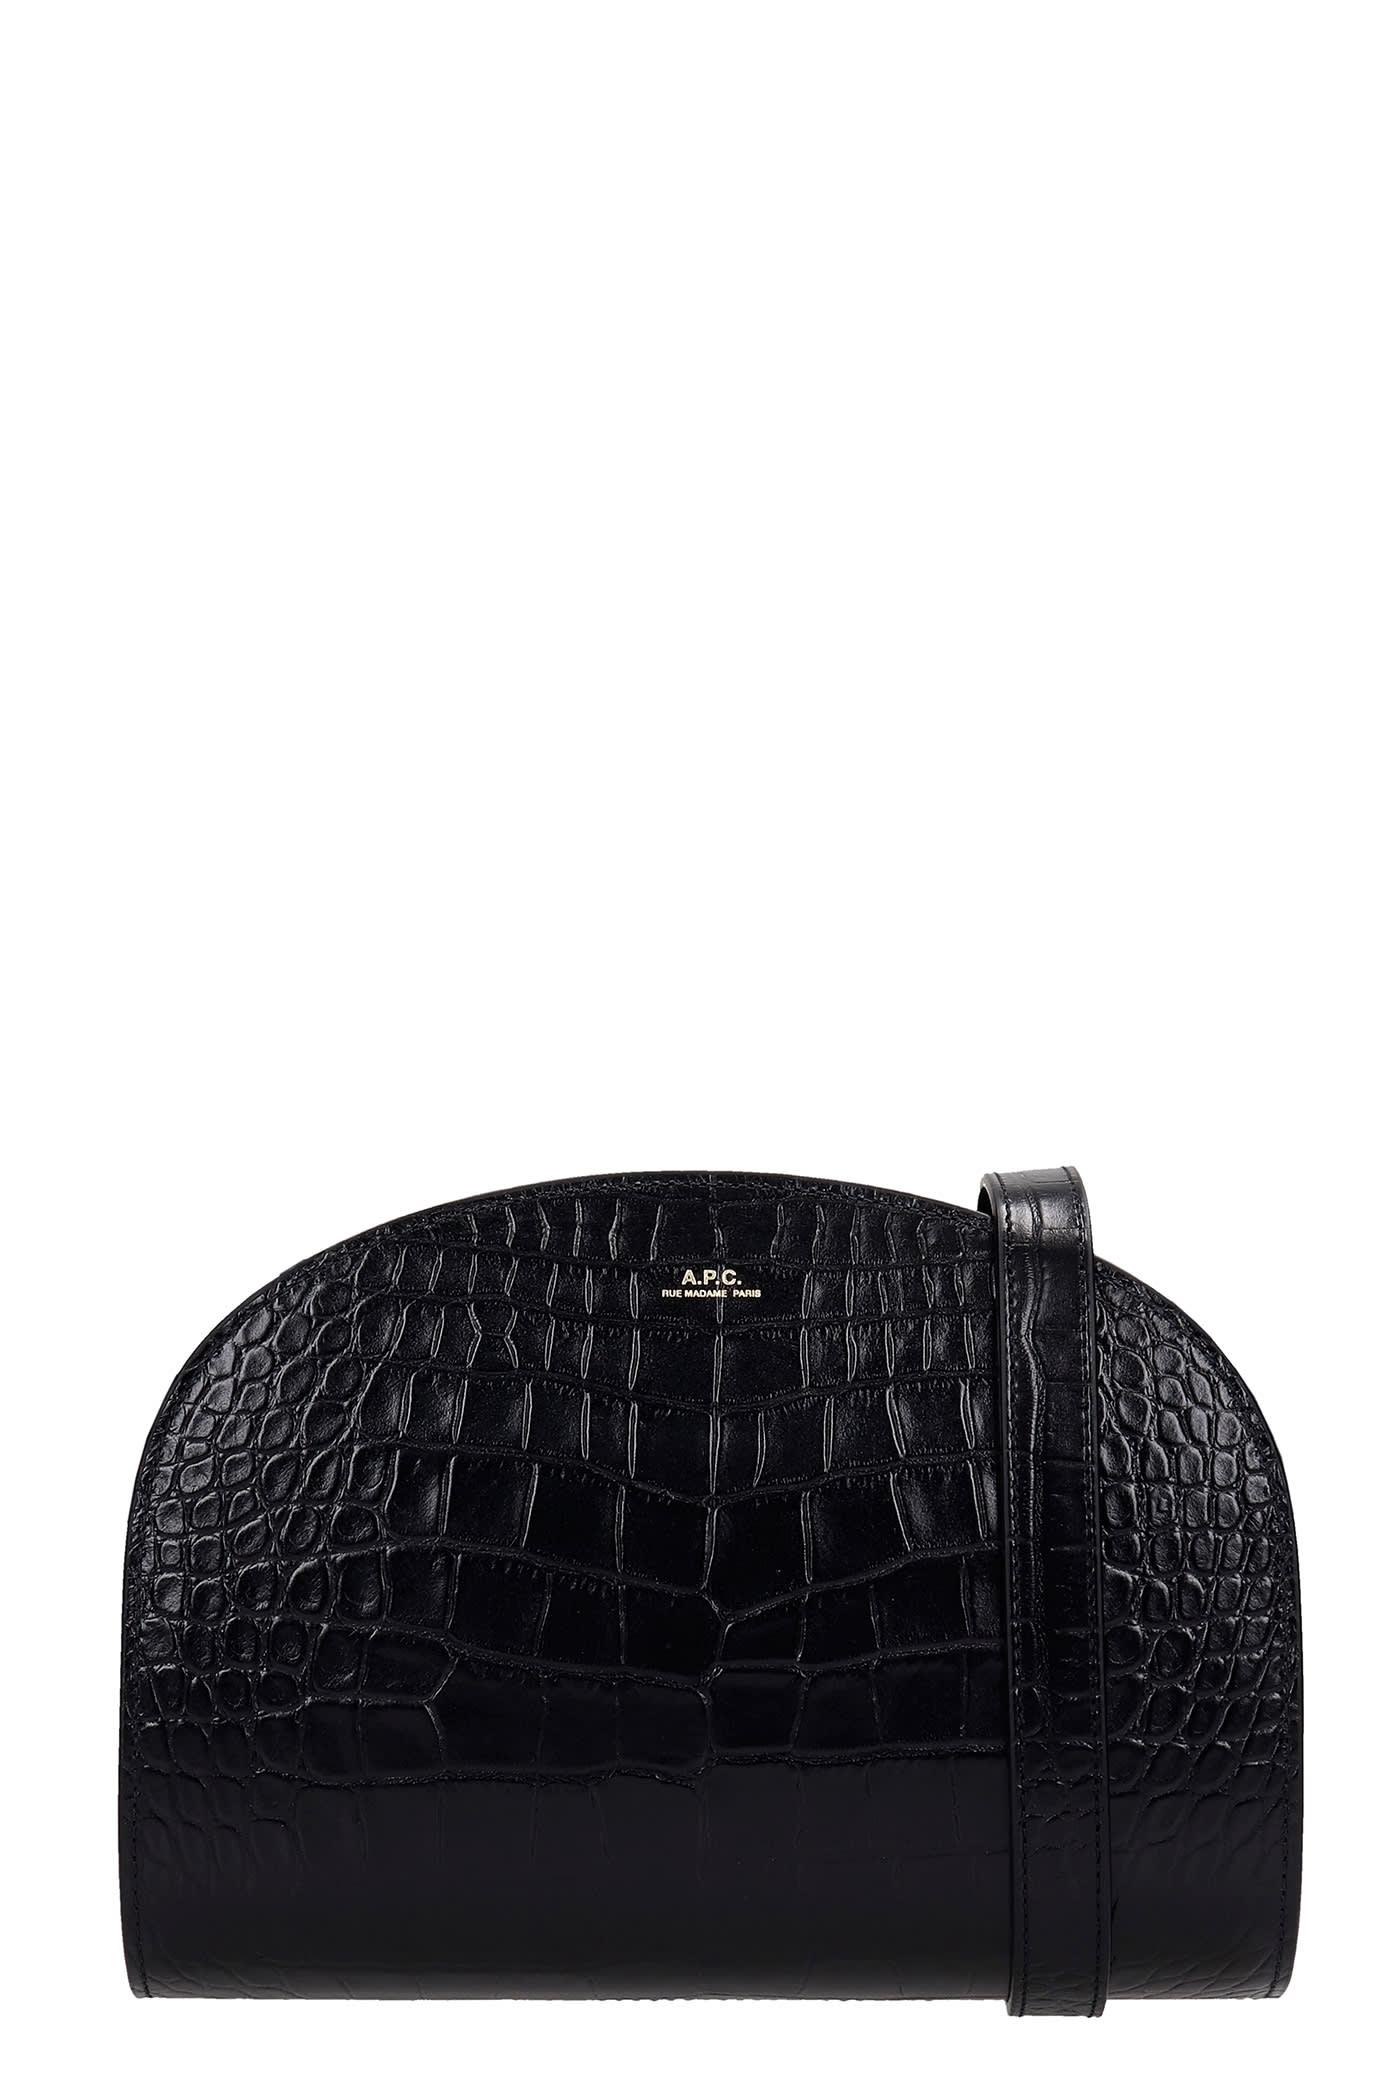 A.P.C. Demi Lune Shoulder Bag In Black Leather